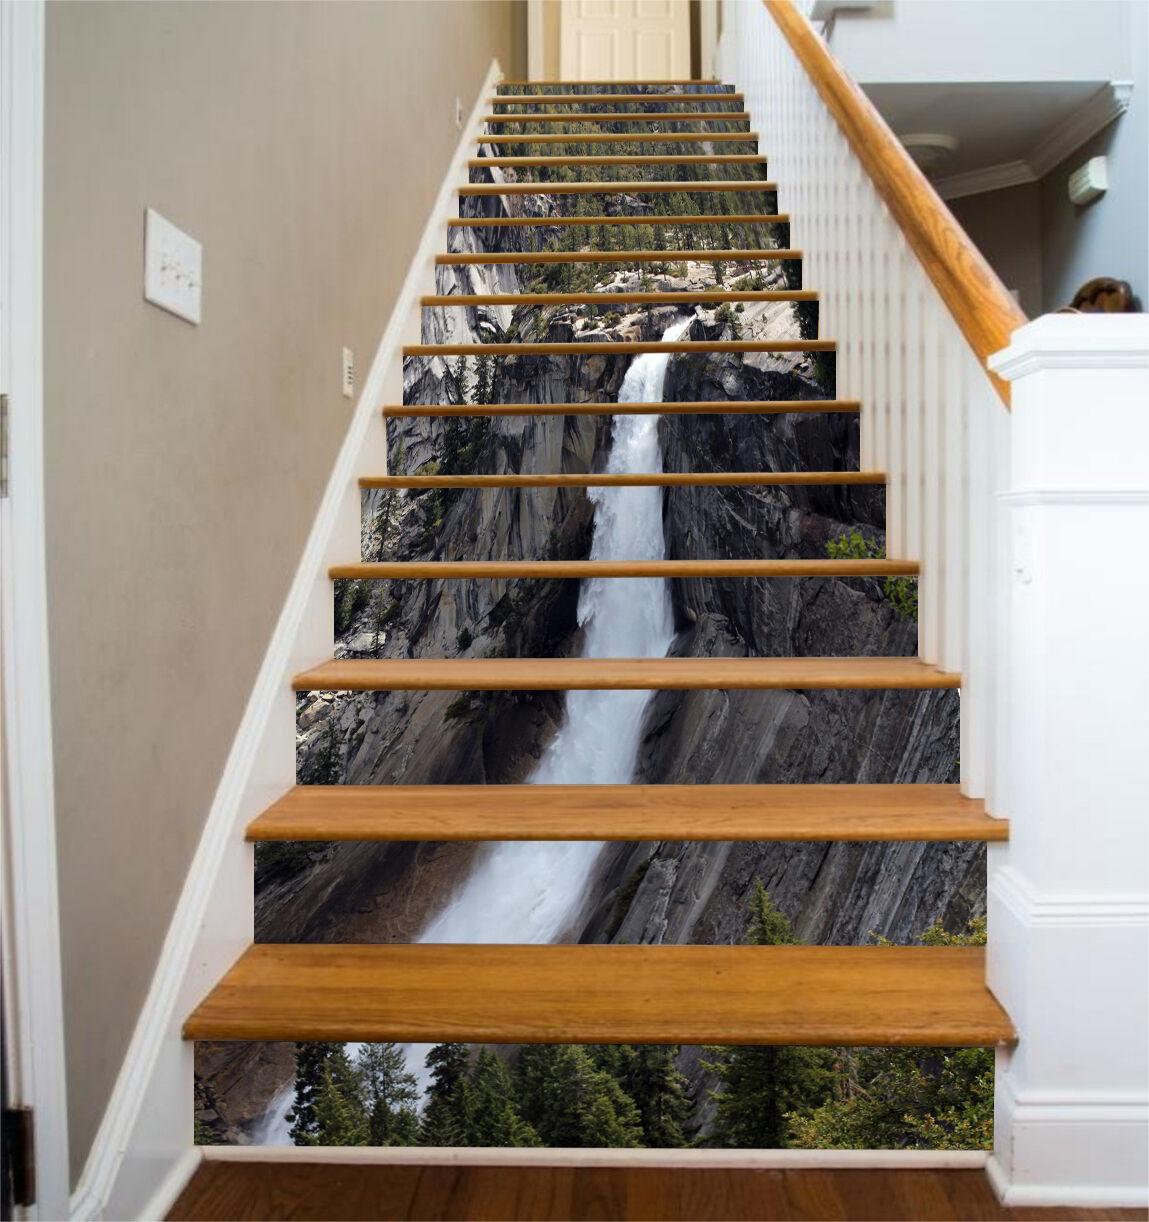 3D Waterfall Line 1 Stair Risers Decoration Photo Mural Vinyl Decal WandPapier AU